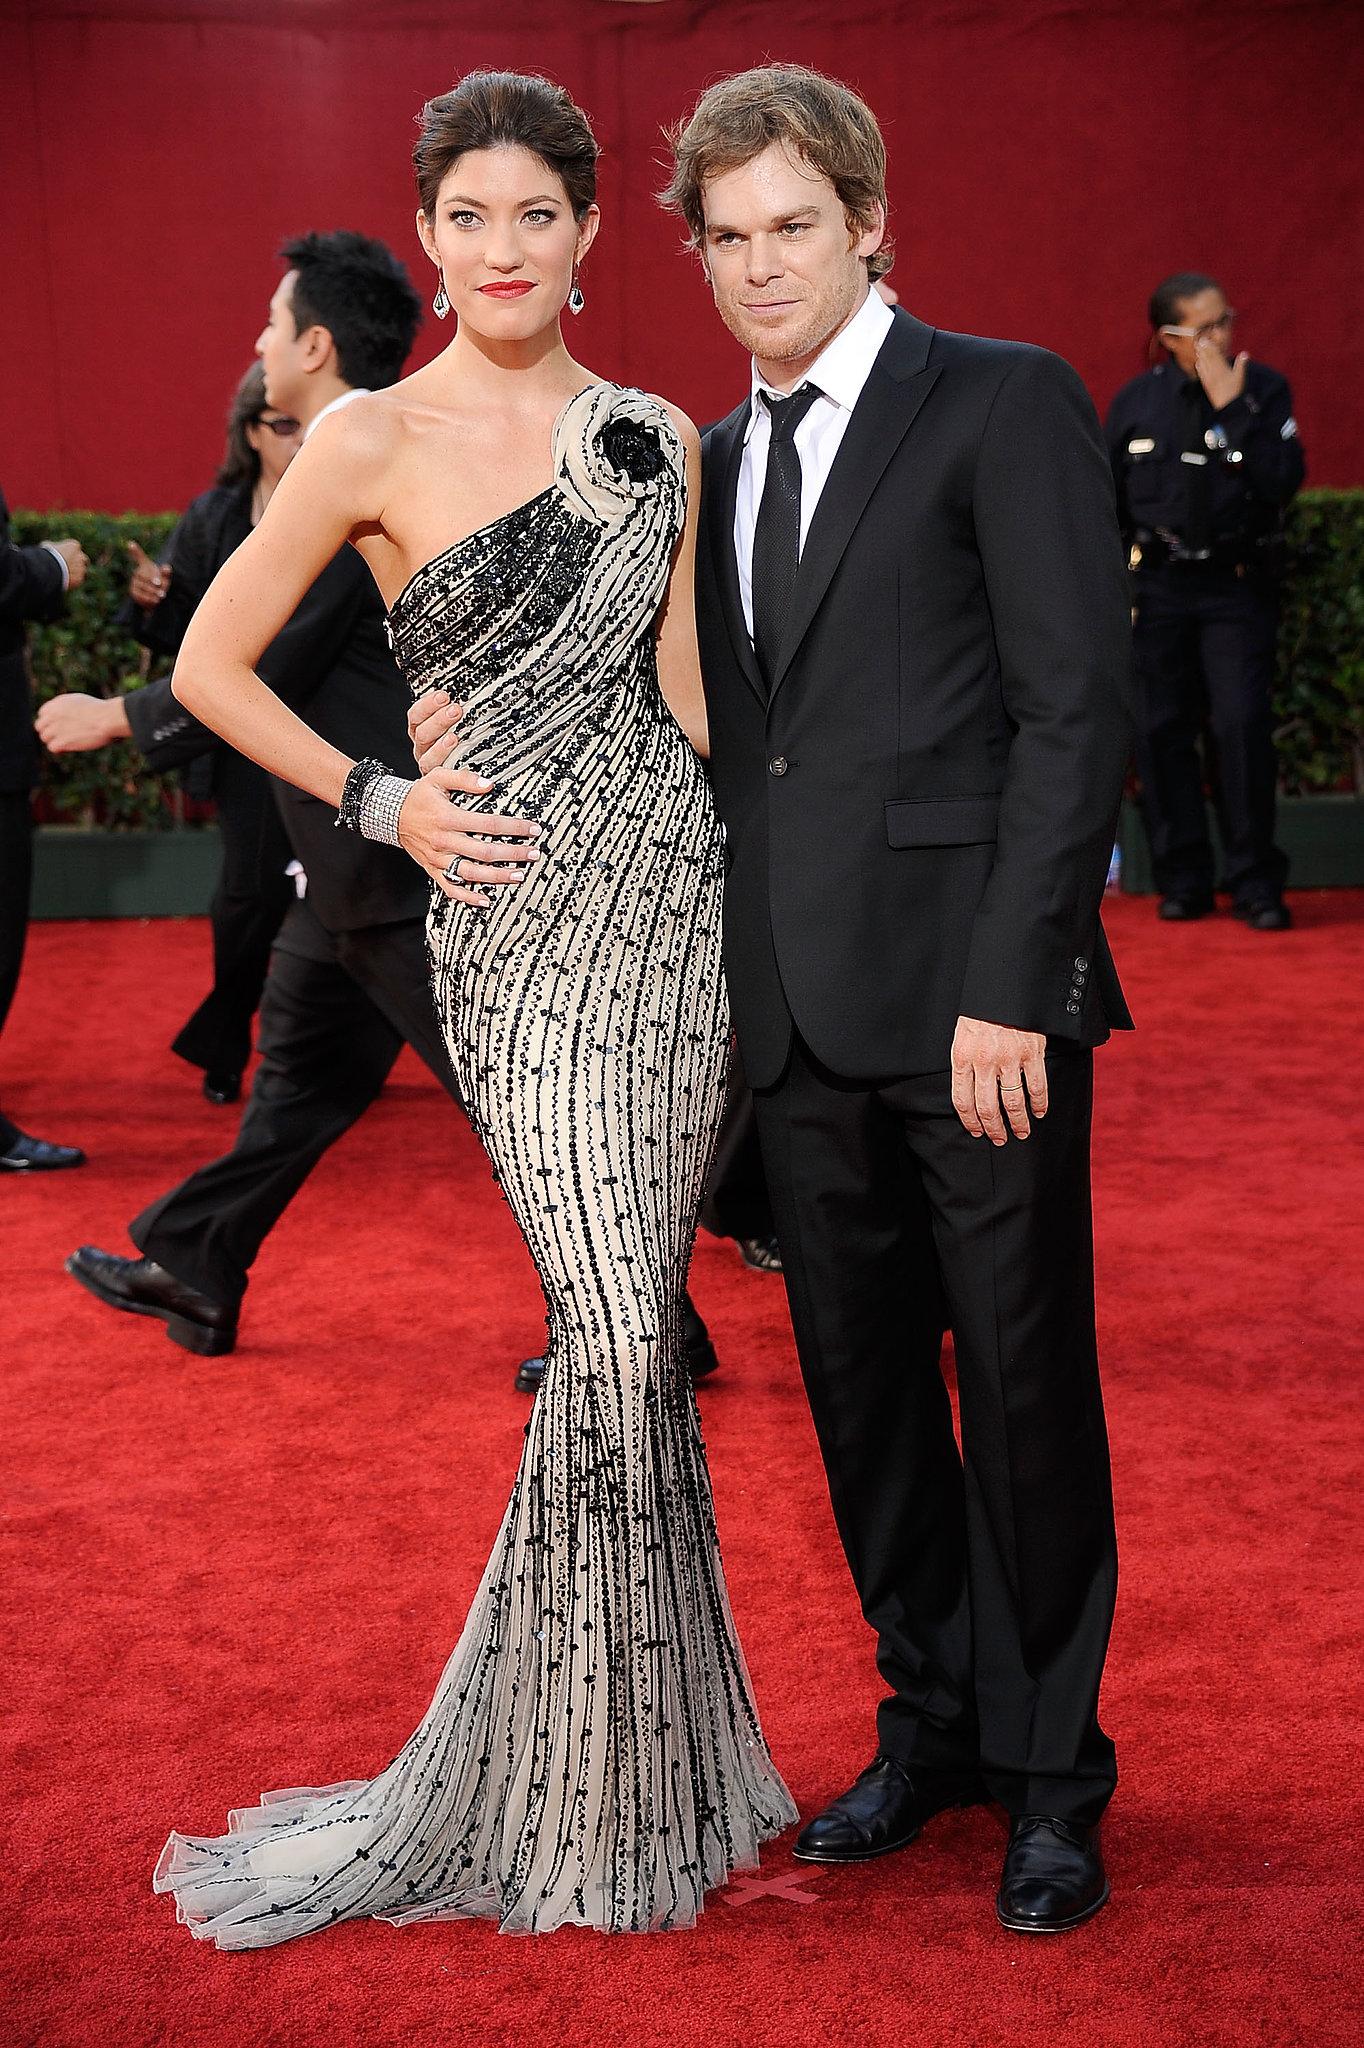 Former Dexter couple Jennifer Carpenter and Michael C. Hall arrived together in 2009.